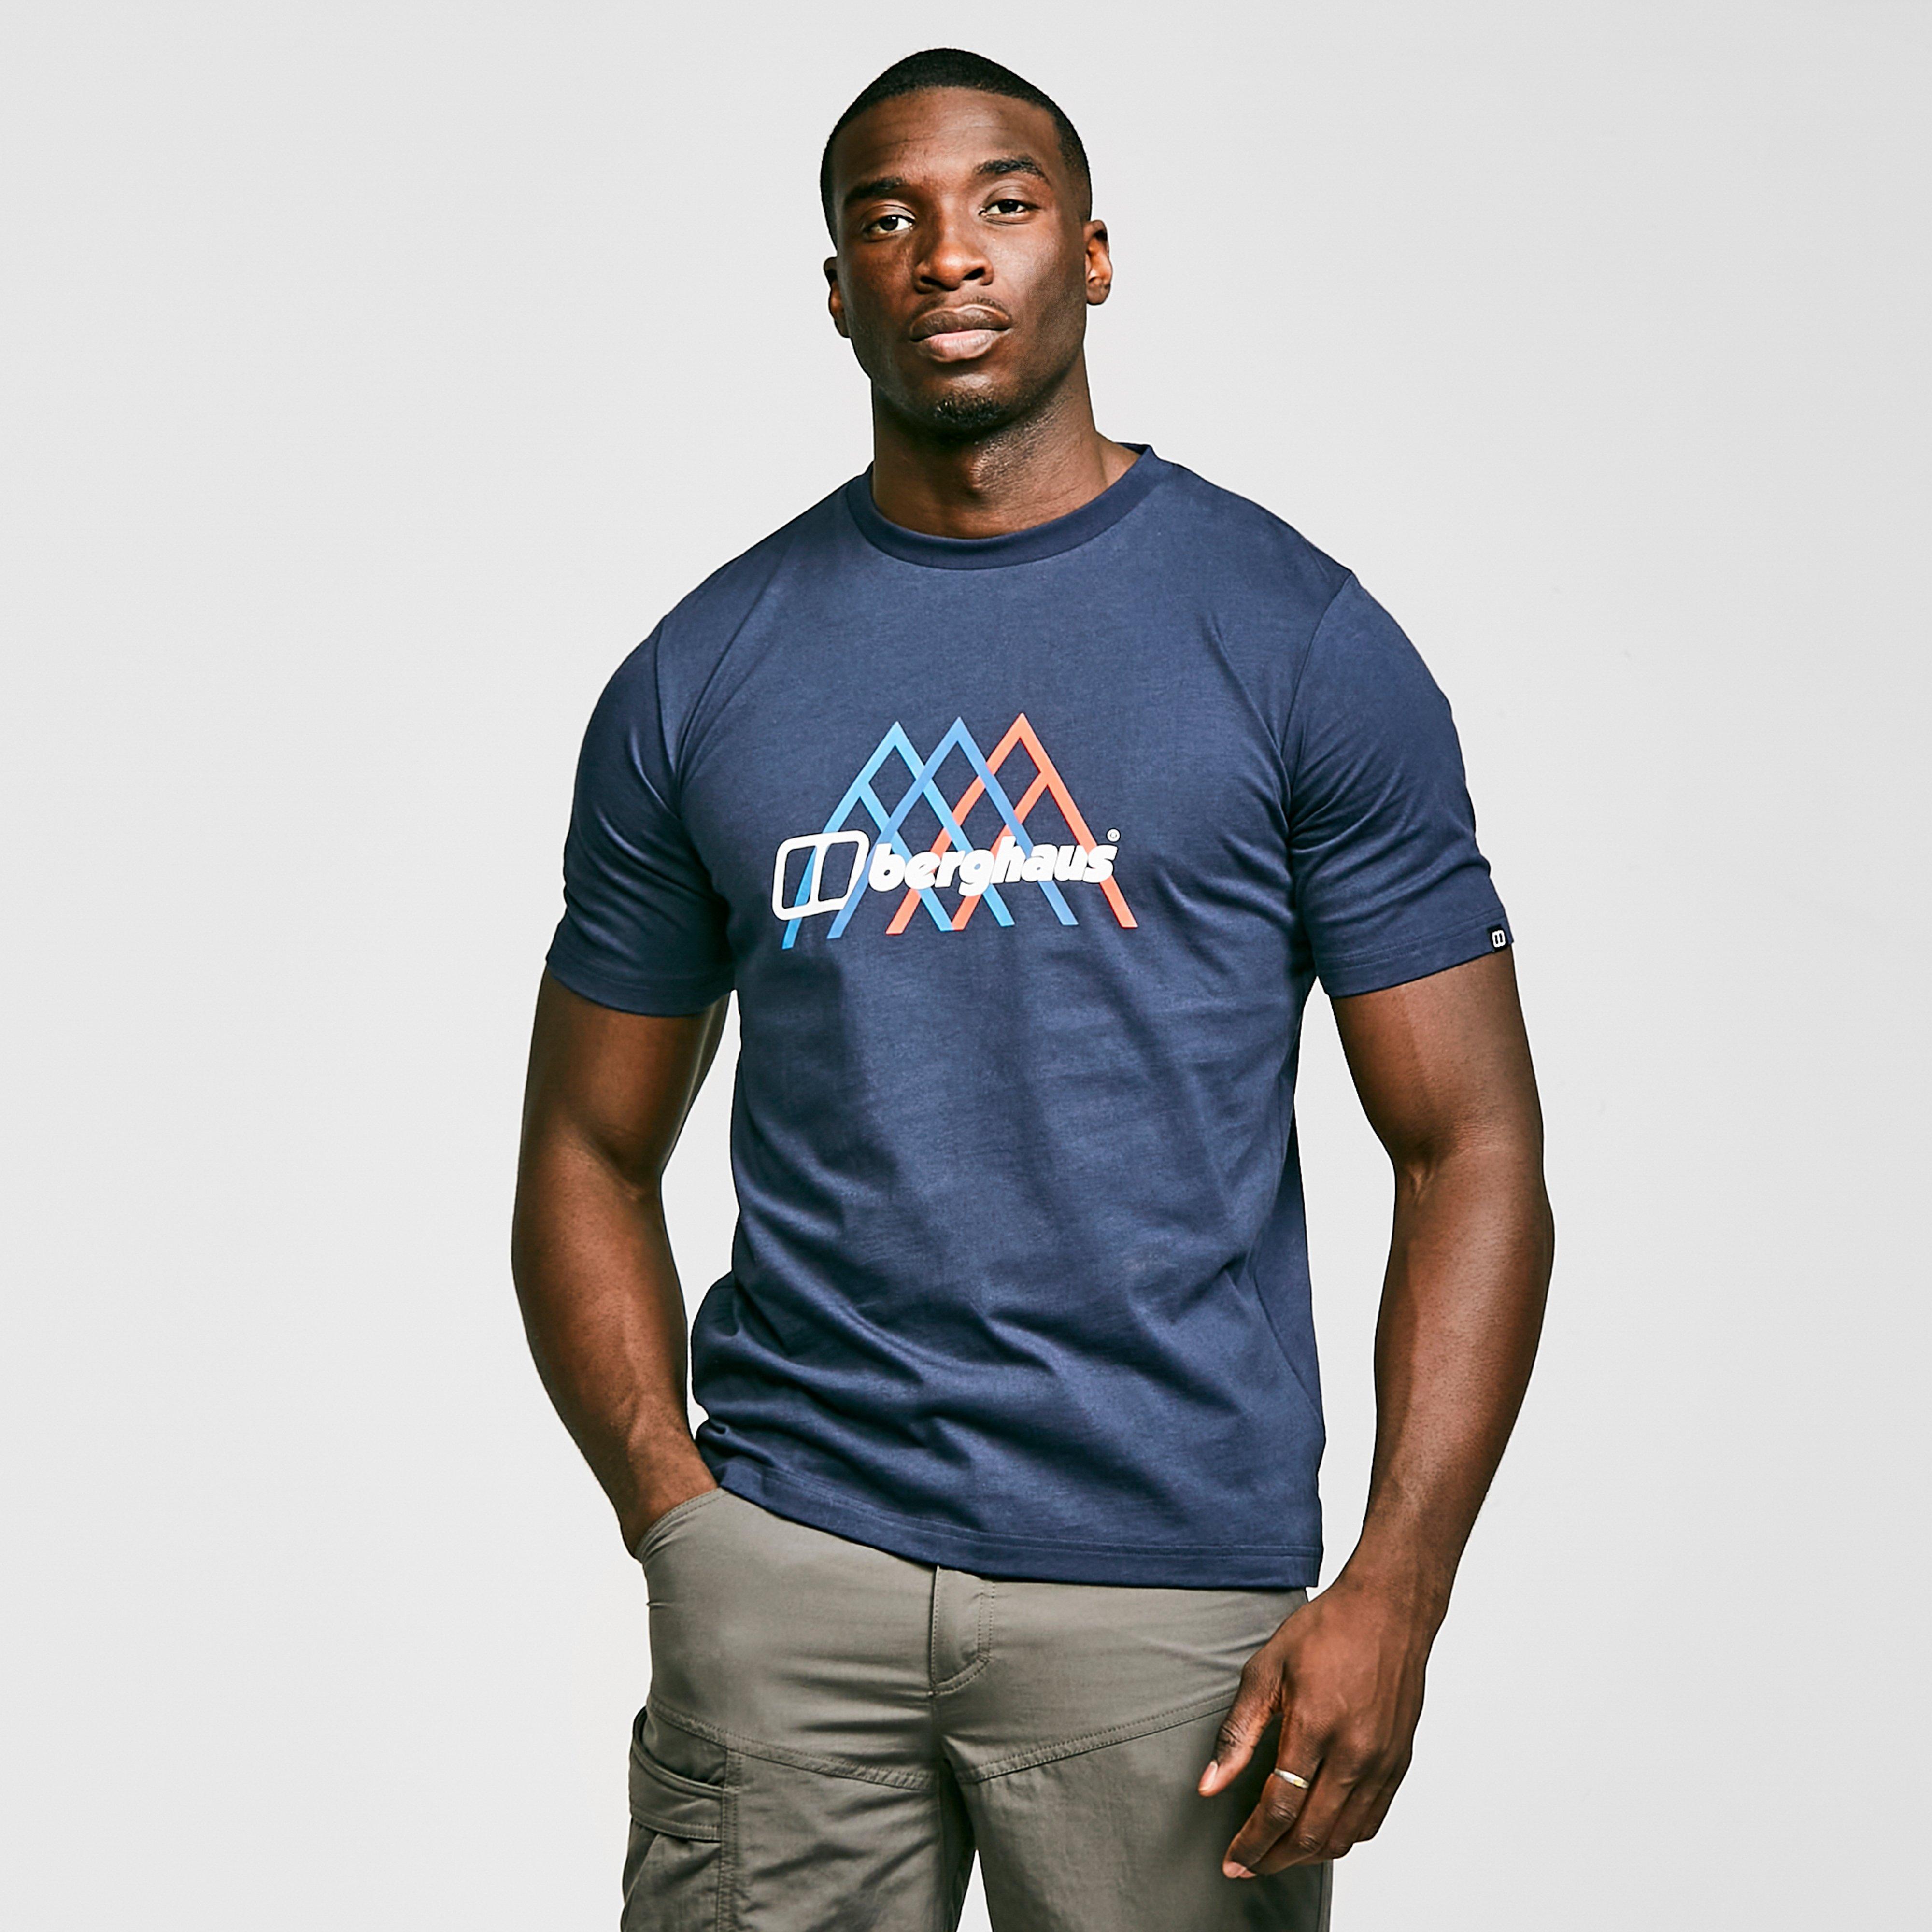 Berghaus Mens Peak Fusion Grid T-shirt - Navy/nvy  Navy/nvy